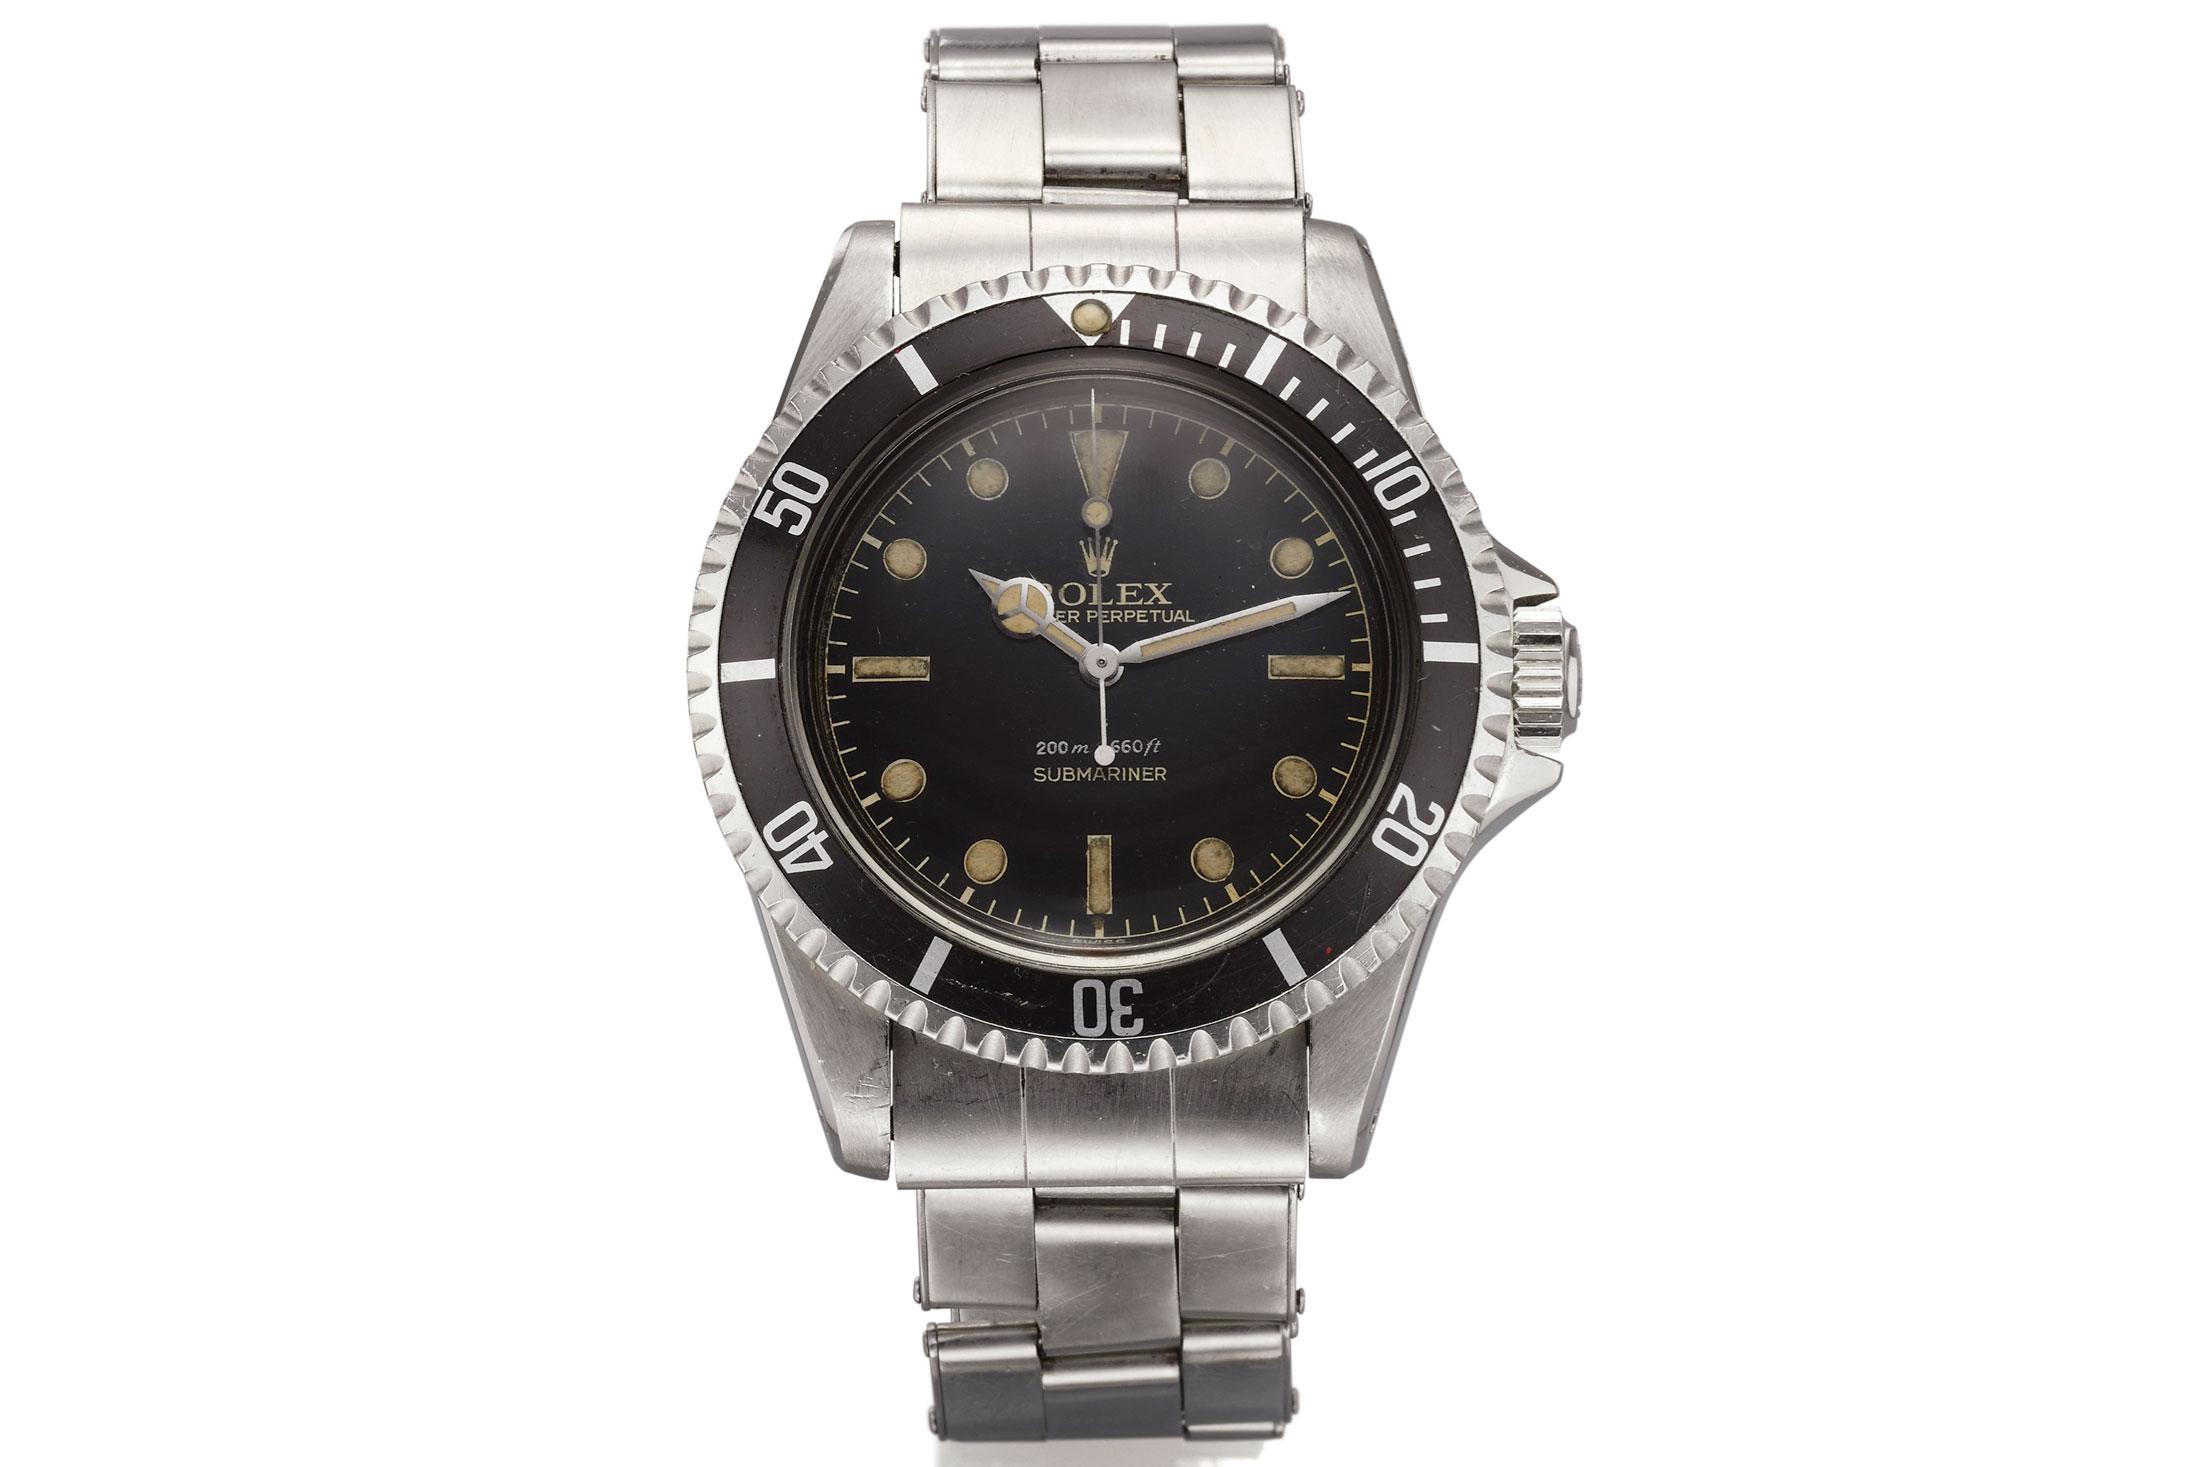 Rolex Gilt Dial Submariner (Lot 173)